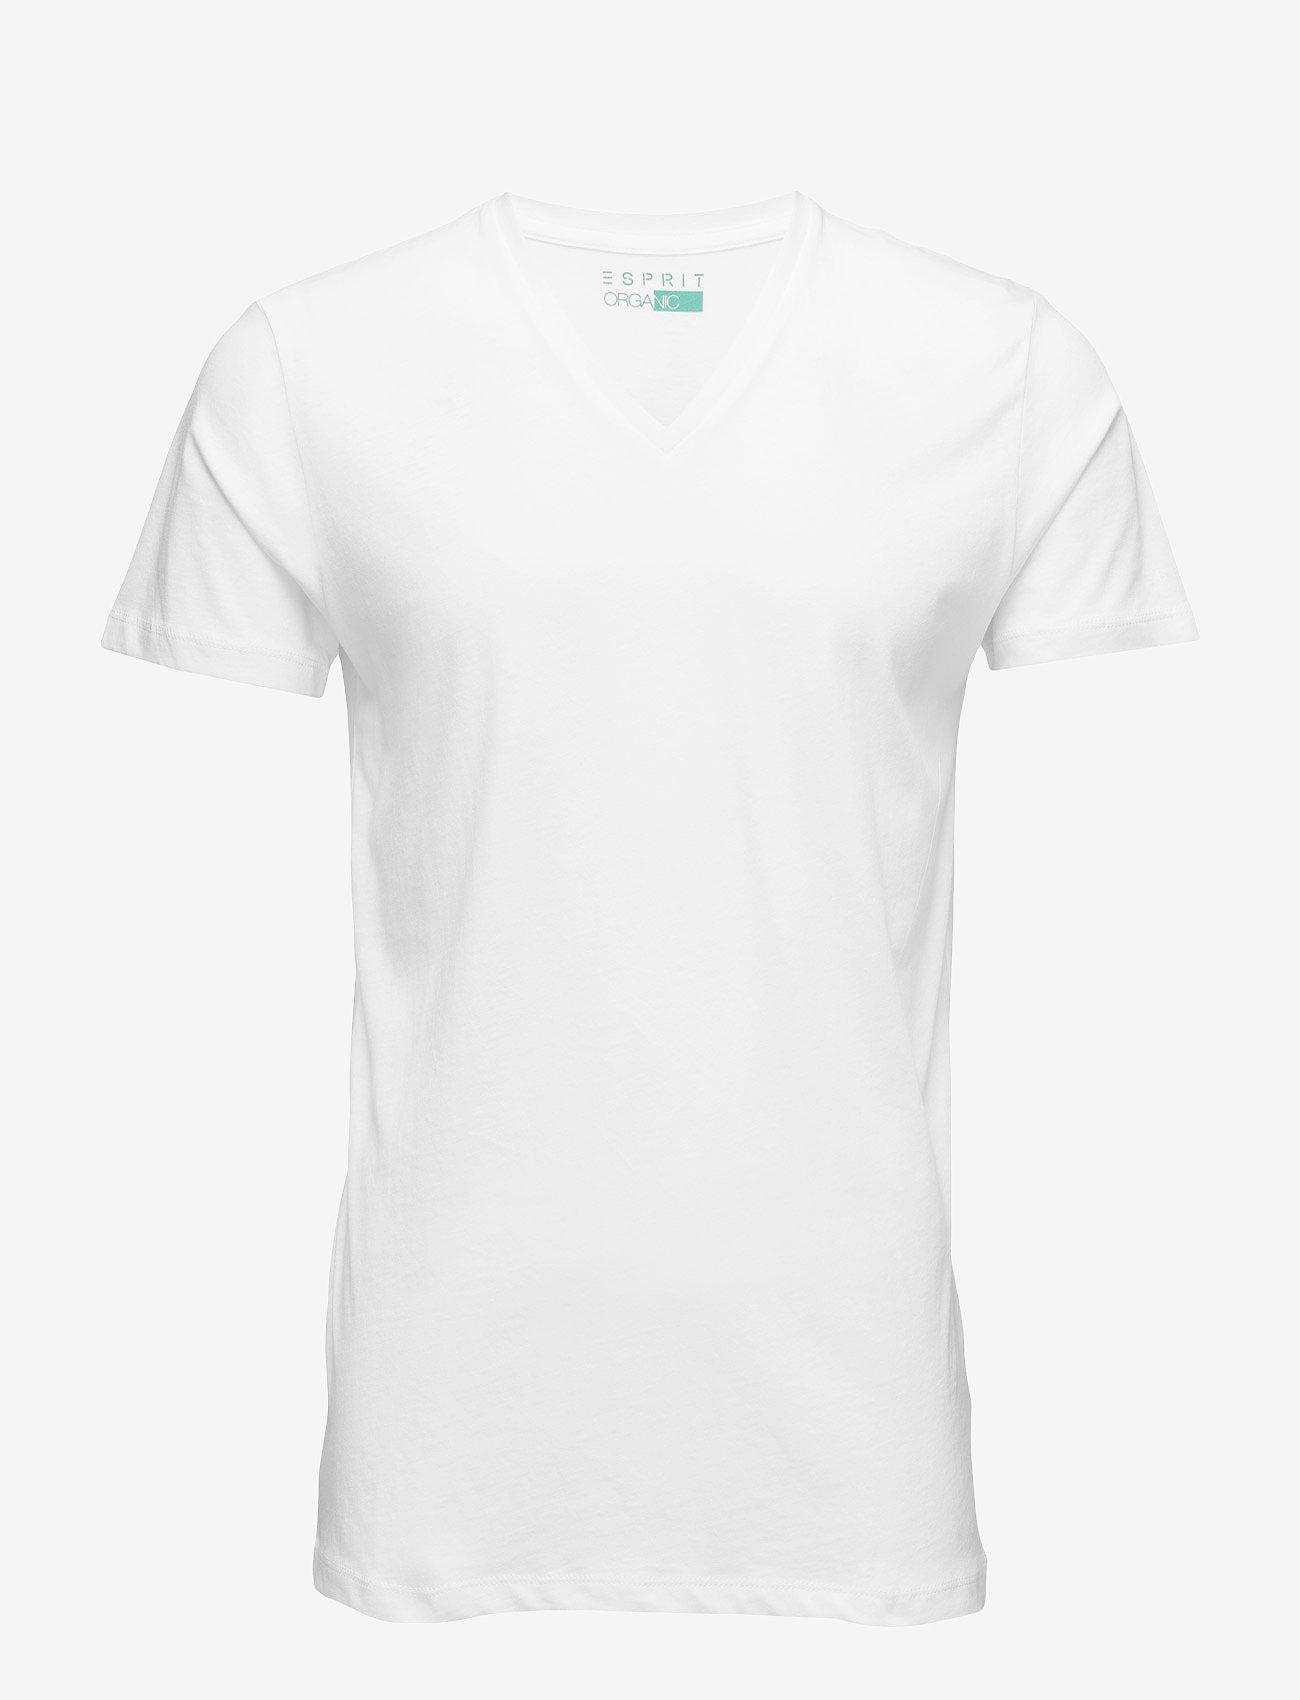 Esprit Casual - T-Shirts - korte mouwen - white - 0